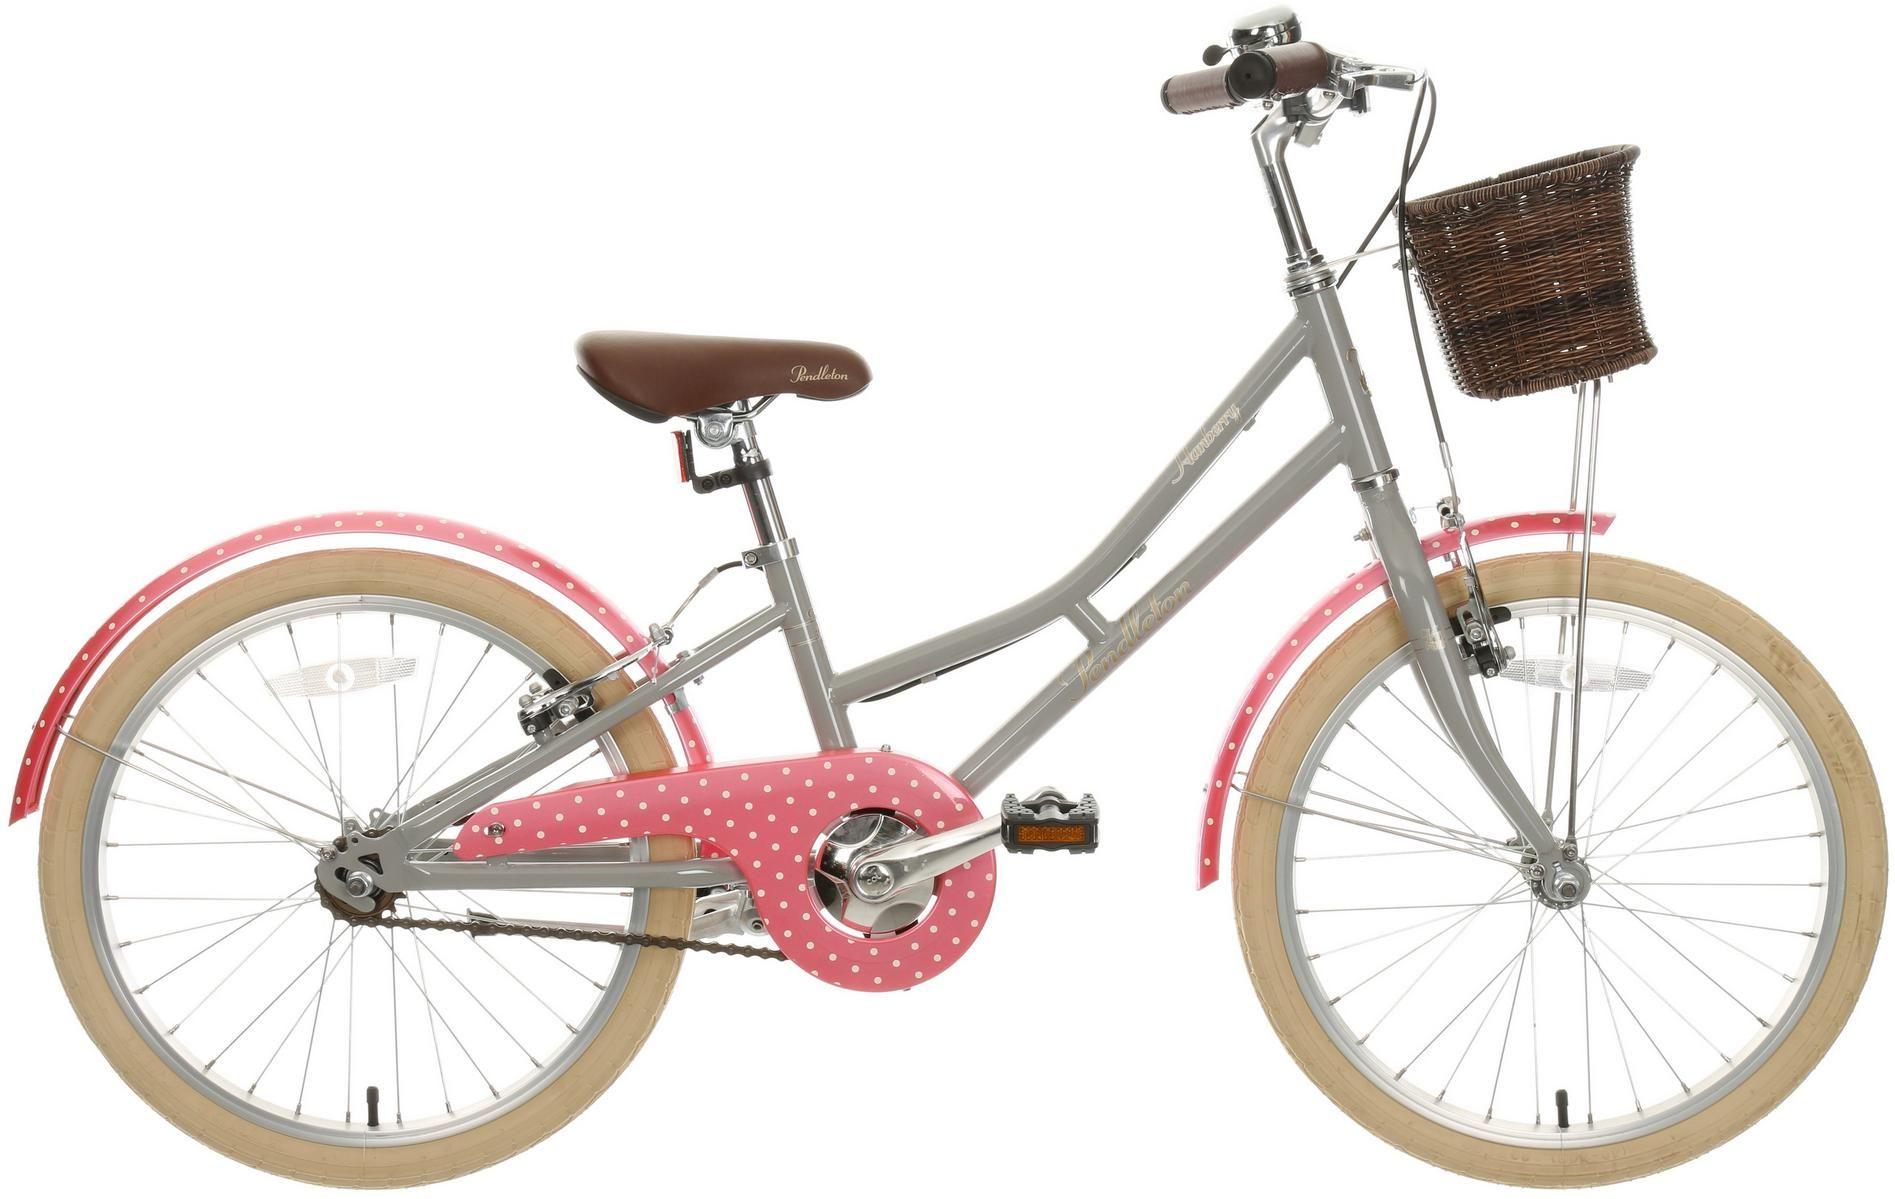 Pendleton Hanberry Kids Bike 20 Wheel Kids Bike Bike 20 Wheels